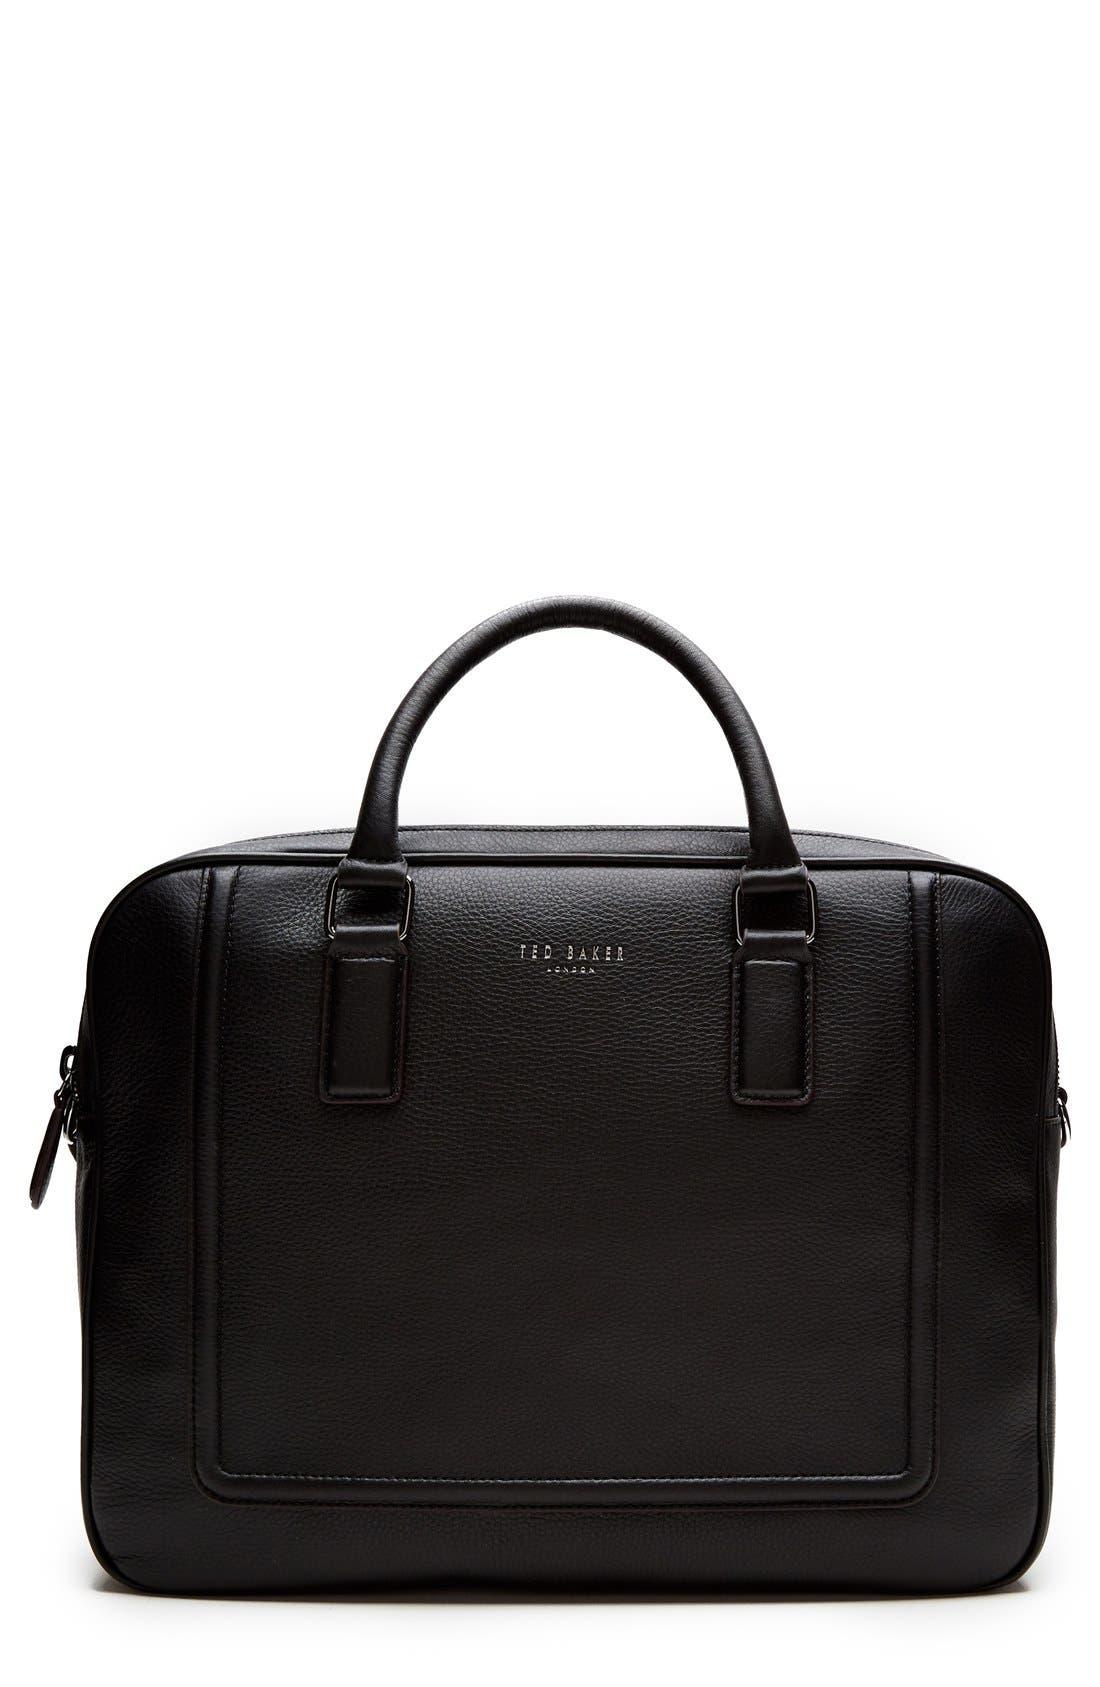 'Ragna' Leather Bowler Bag, Main, color, 001